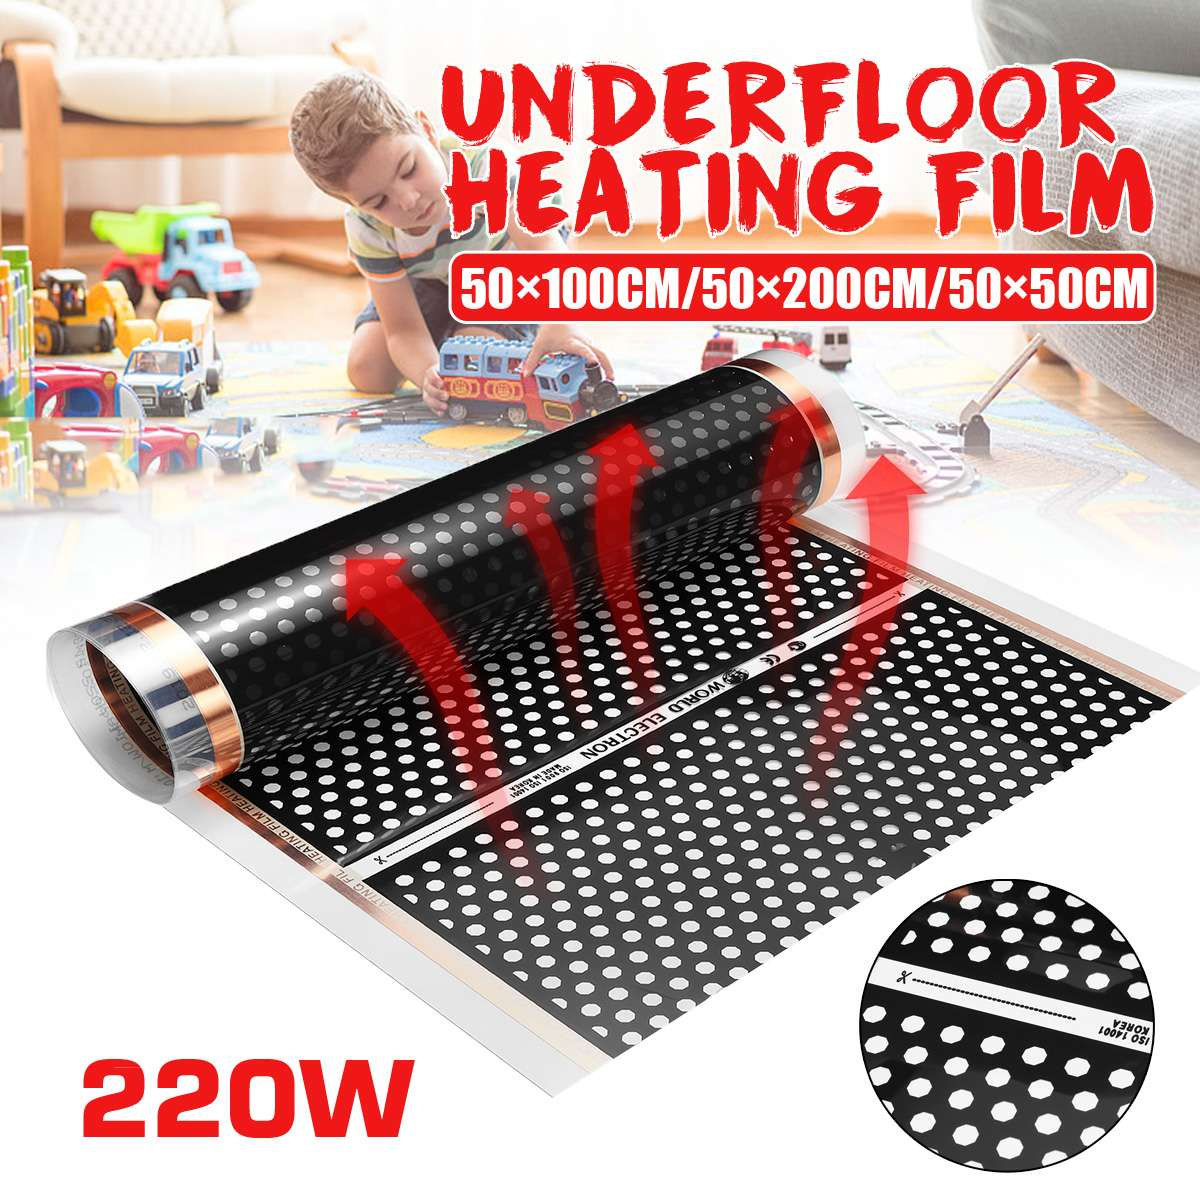 50cm Electric Floor Heating Film Underfloor Infrared Heater Floor Warmer Warm Mat Laminate / Solid Flooring Heating System